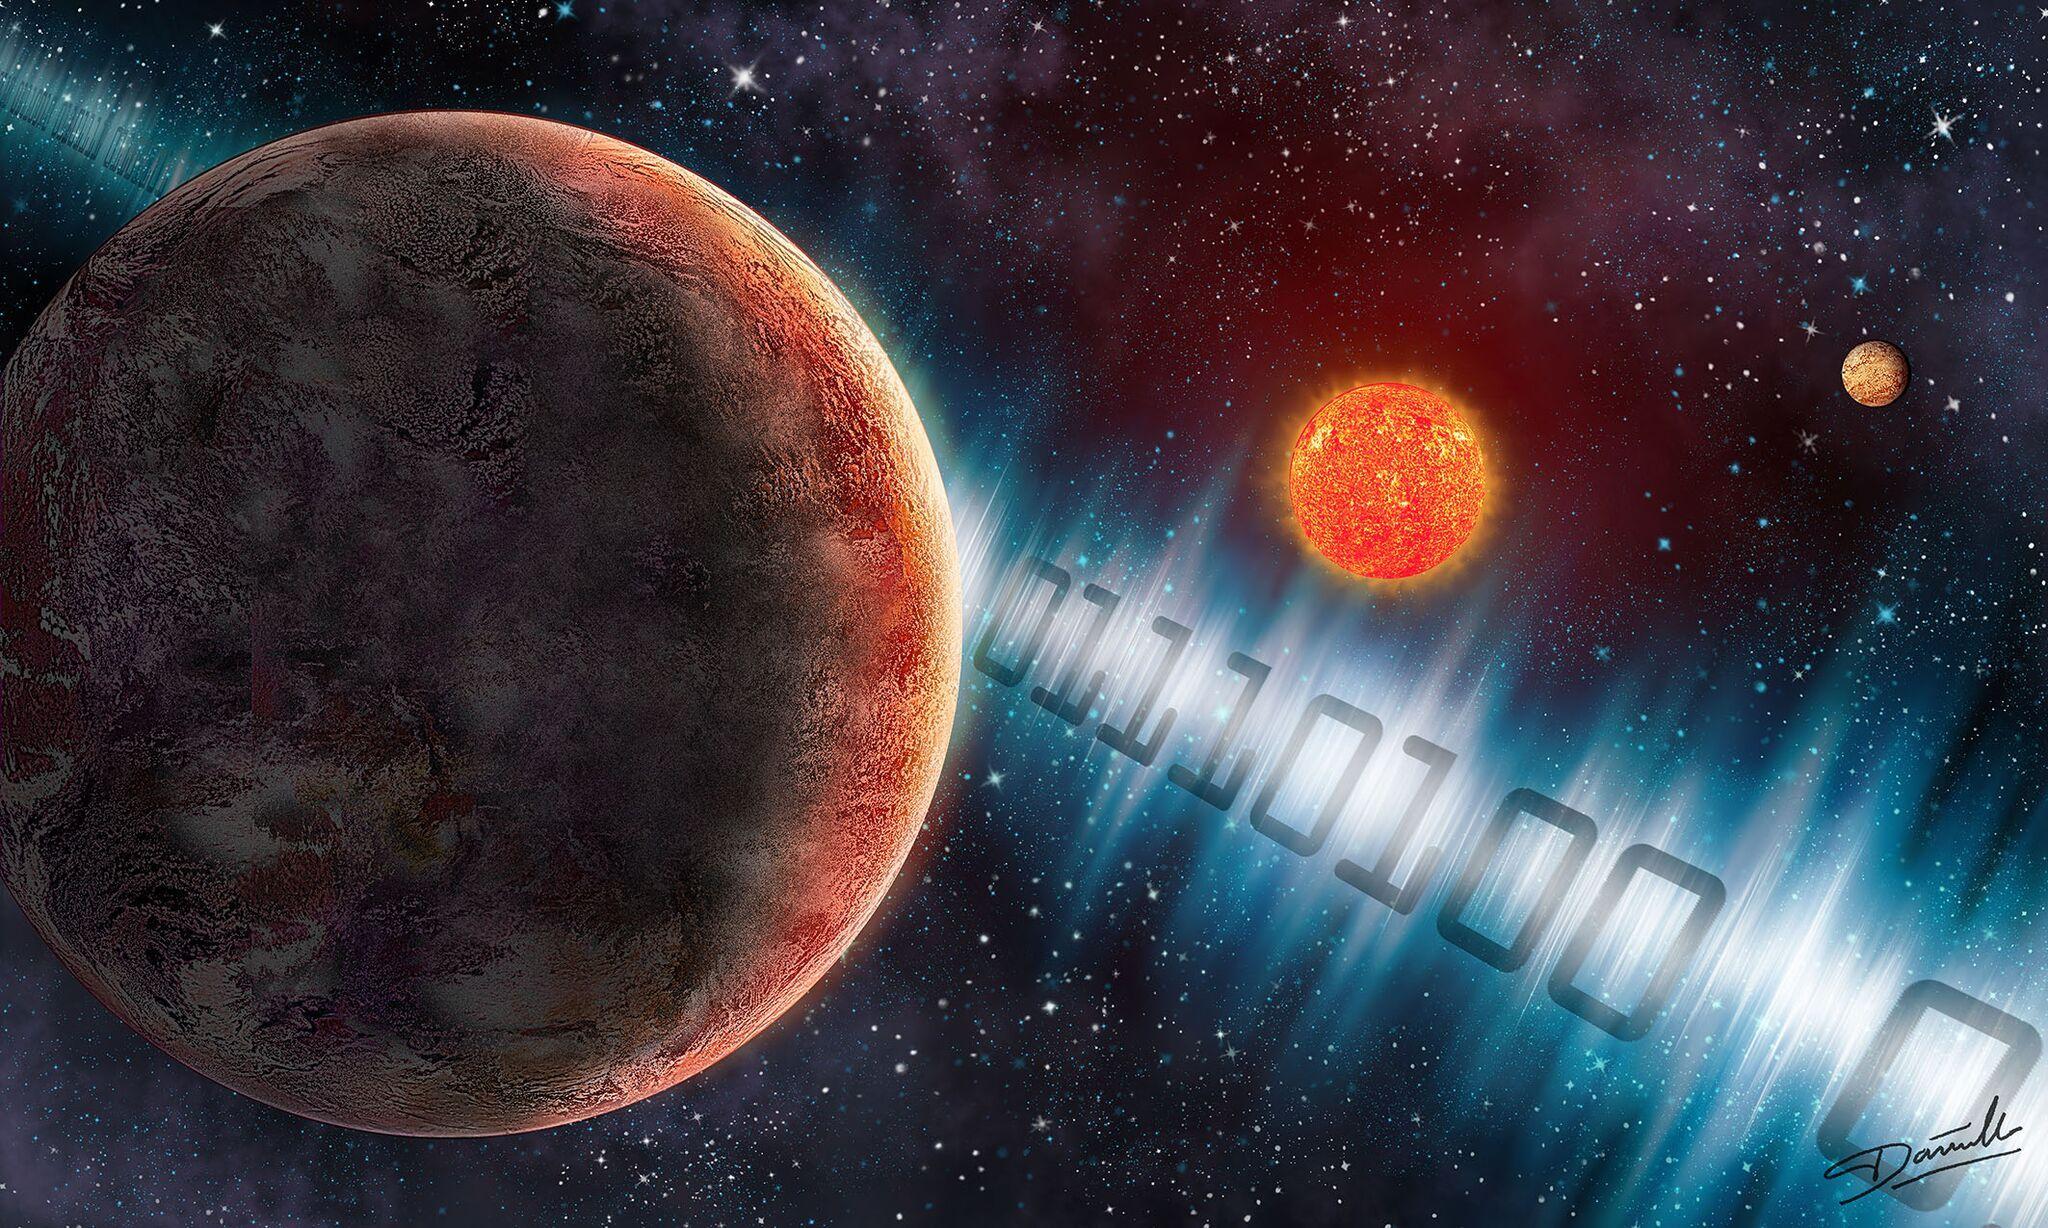 11_16_message aliens